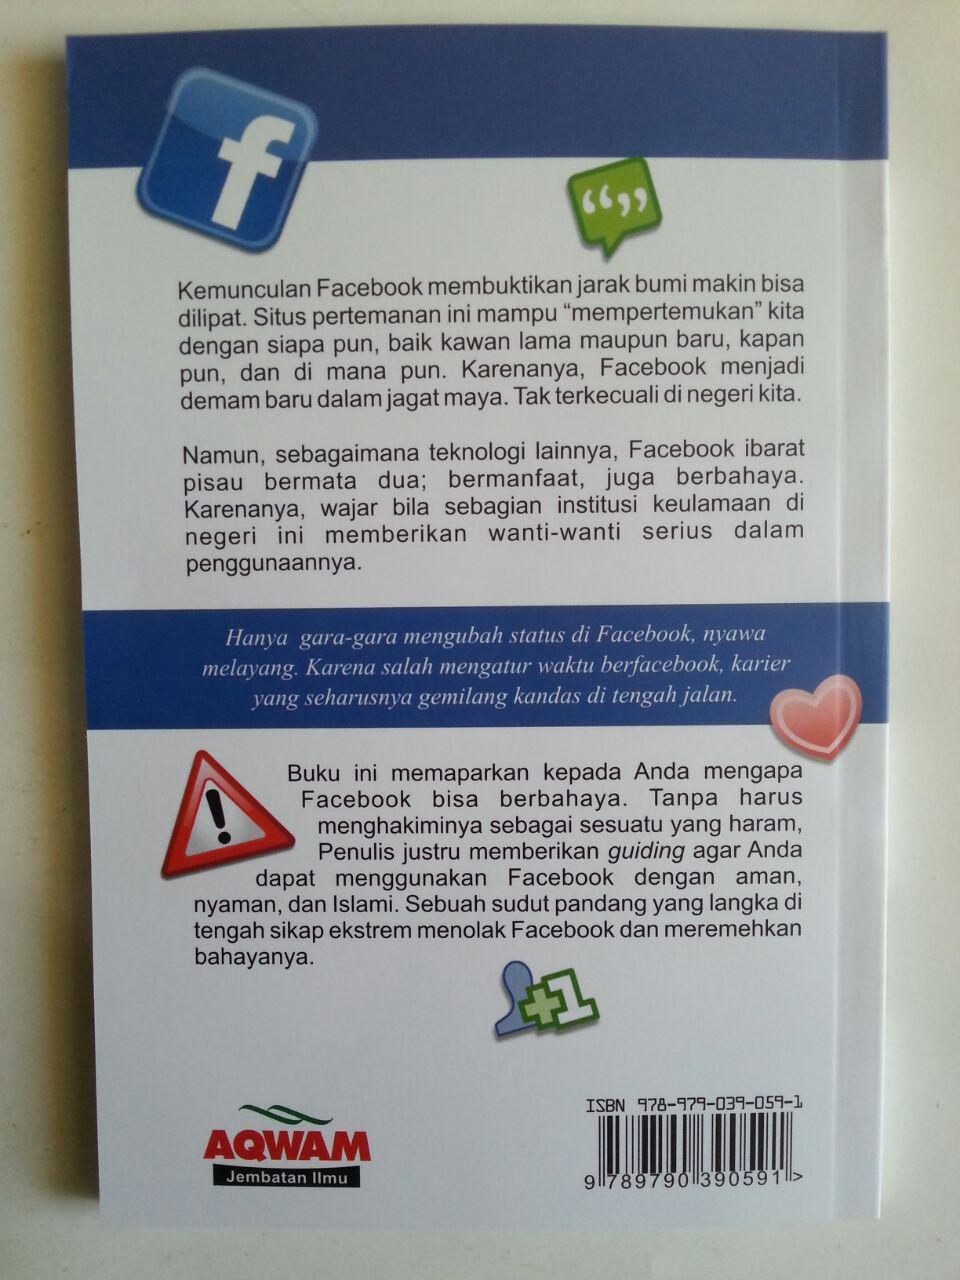 Buku Bahaya Facebook Bagaimana Berfacebook Dengan Aman Sehat Islami cover